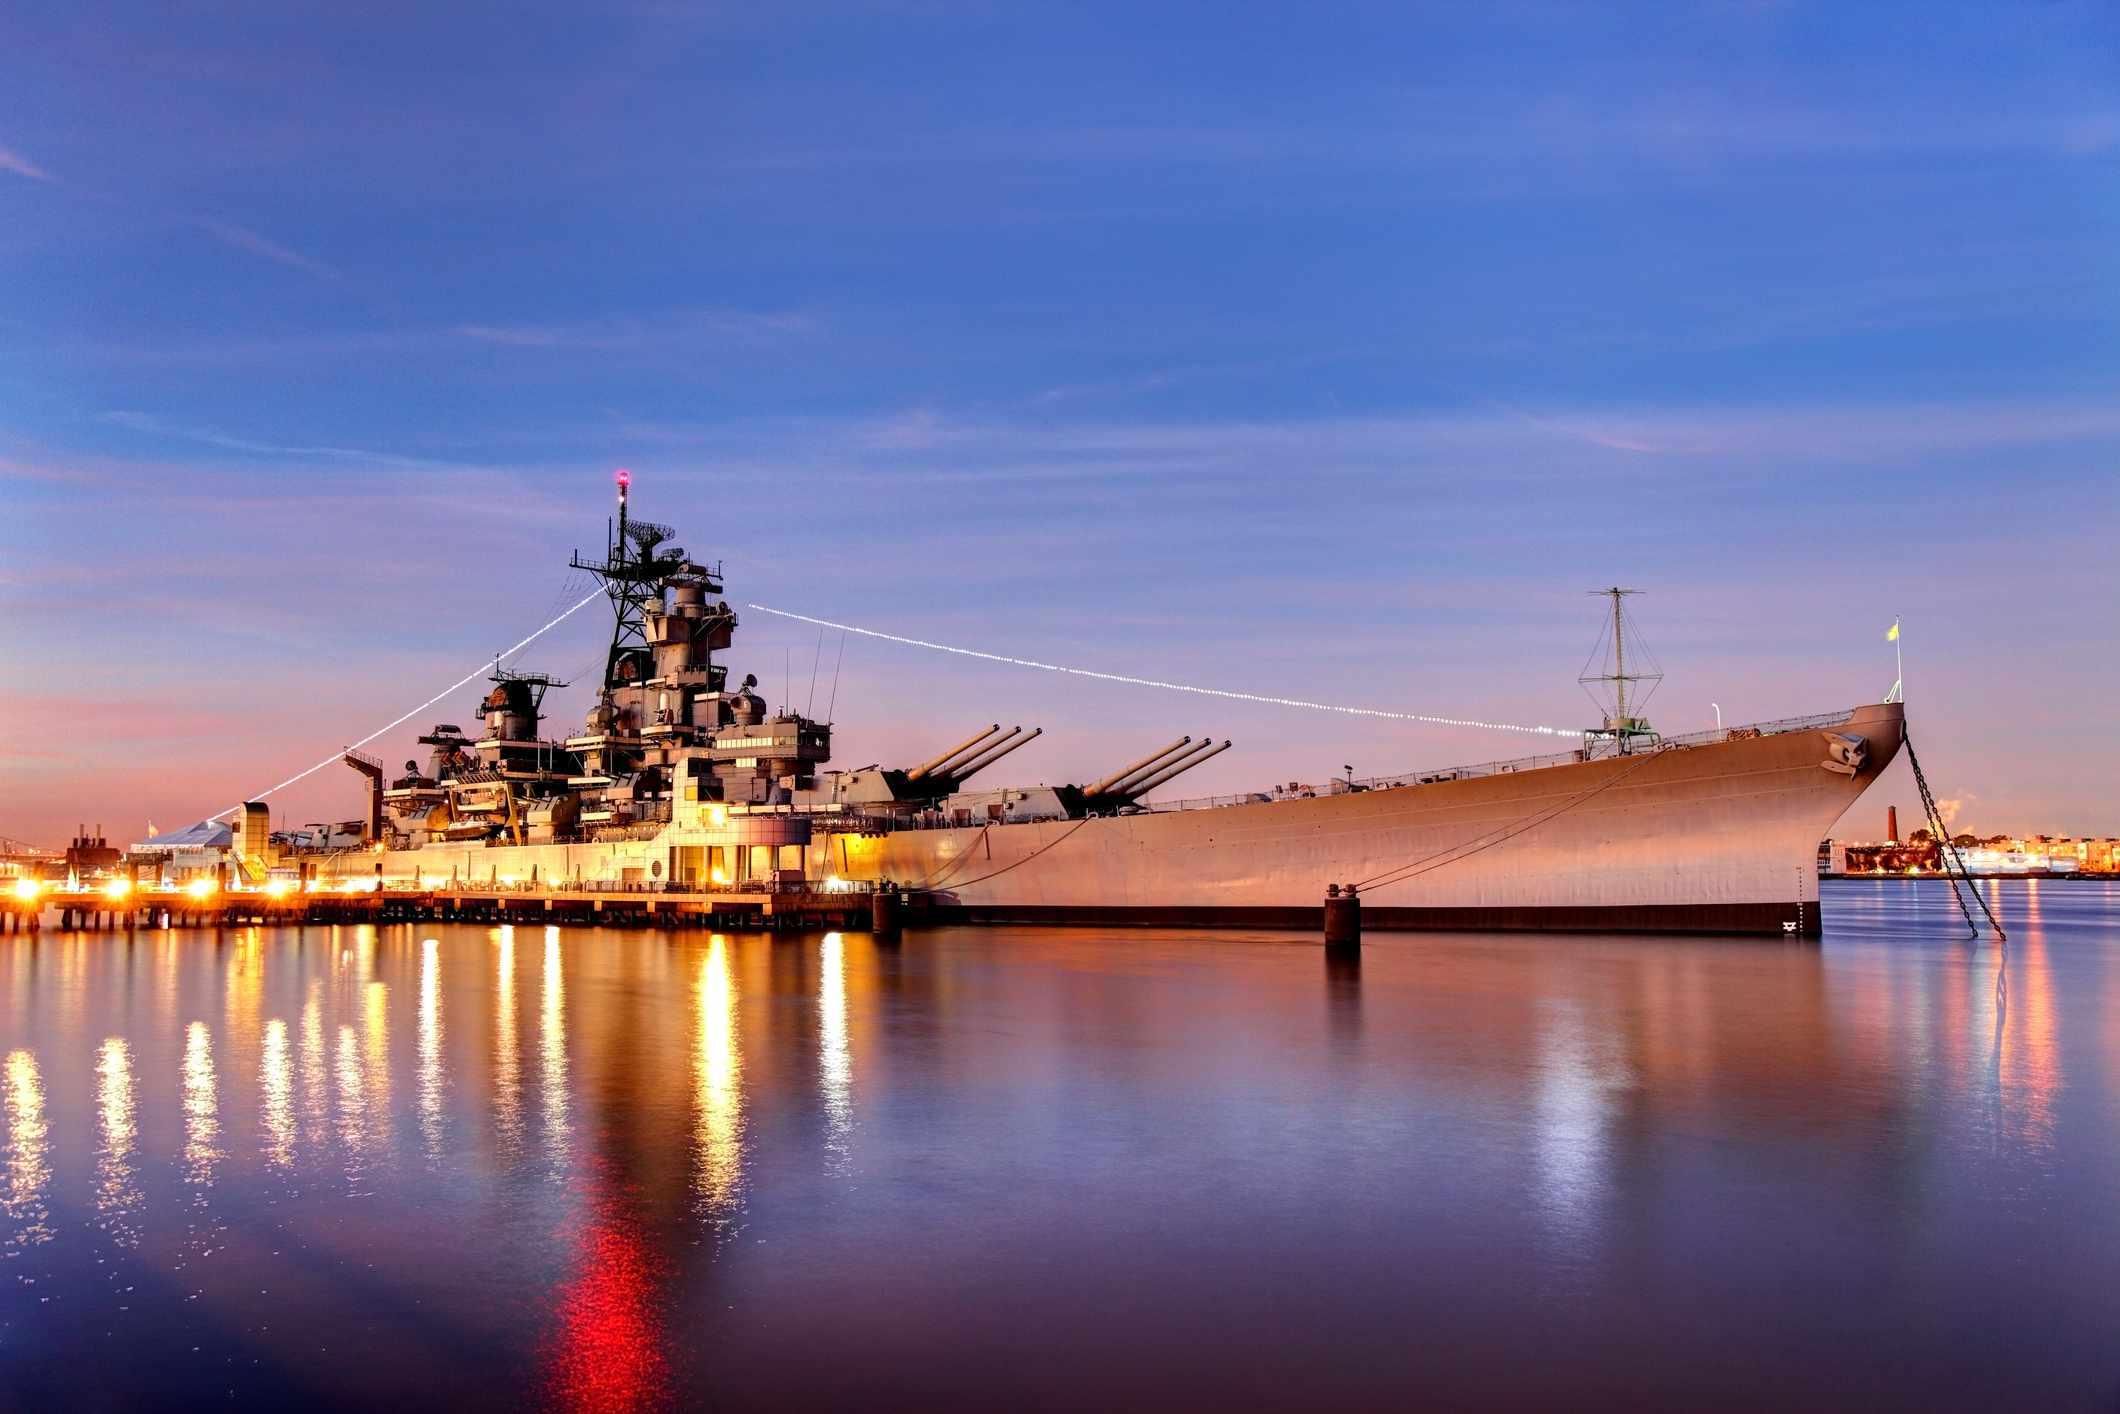 Battleship New Jersey at night